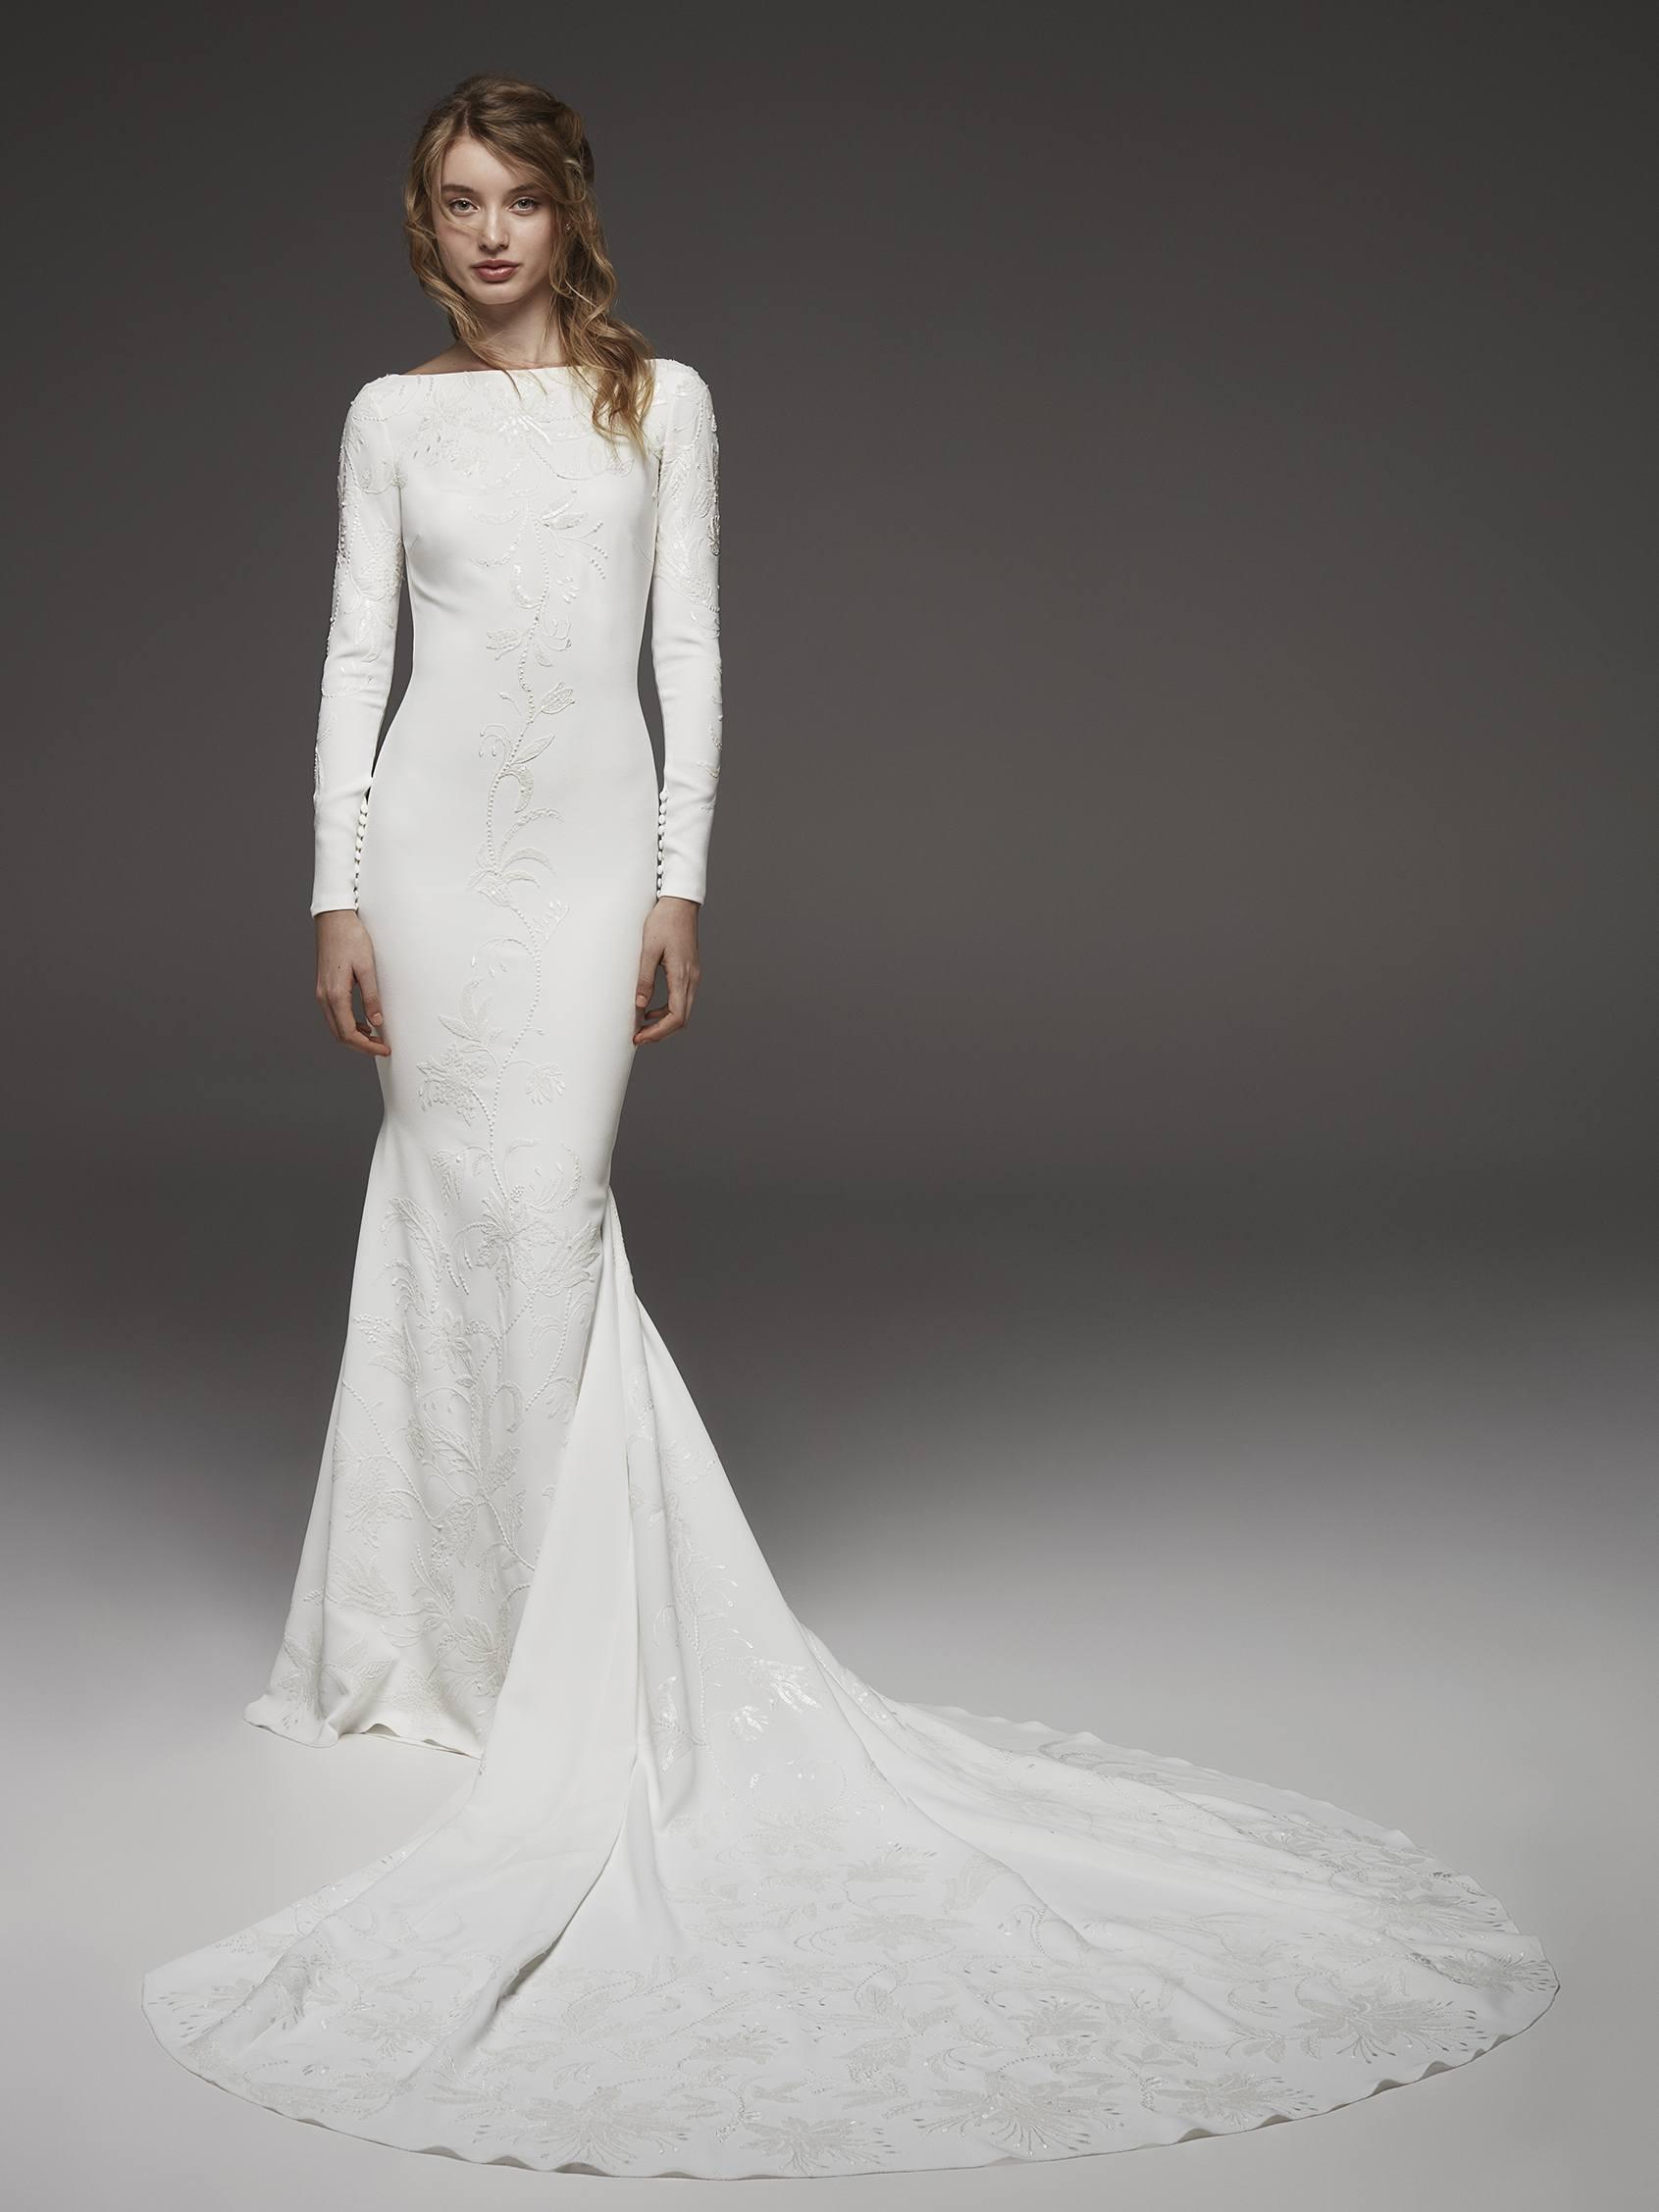 Bateau Neckline Long Sleeve Simply Elegant Wedding Dress Kleinfeld Bridal: Bateau Neckline Wedding Dresses At Websimilar.org